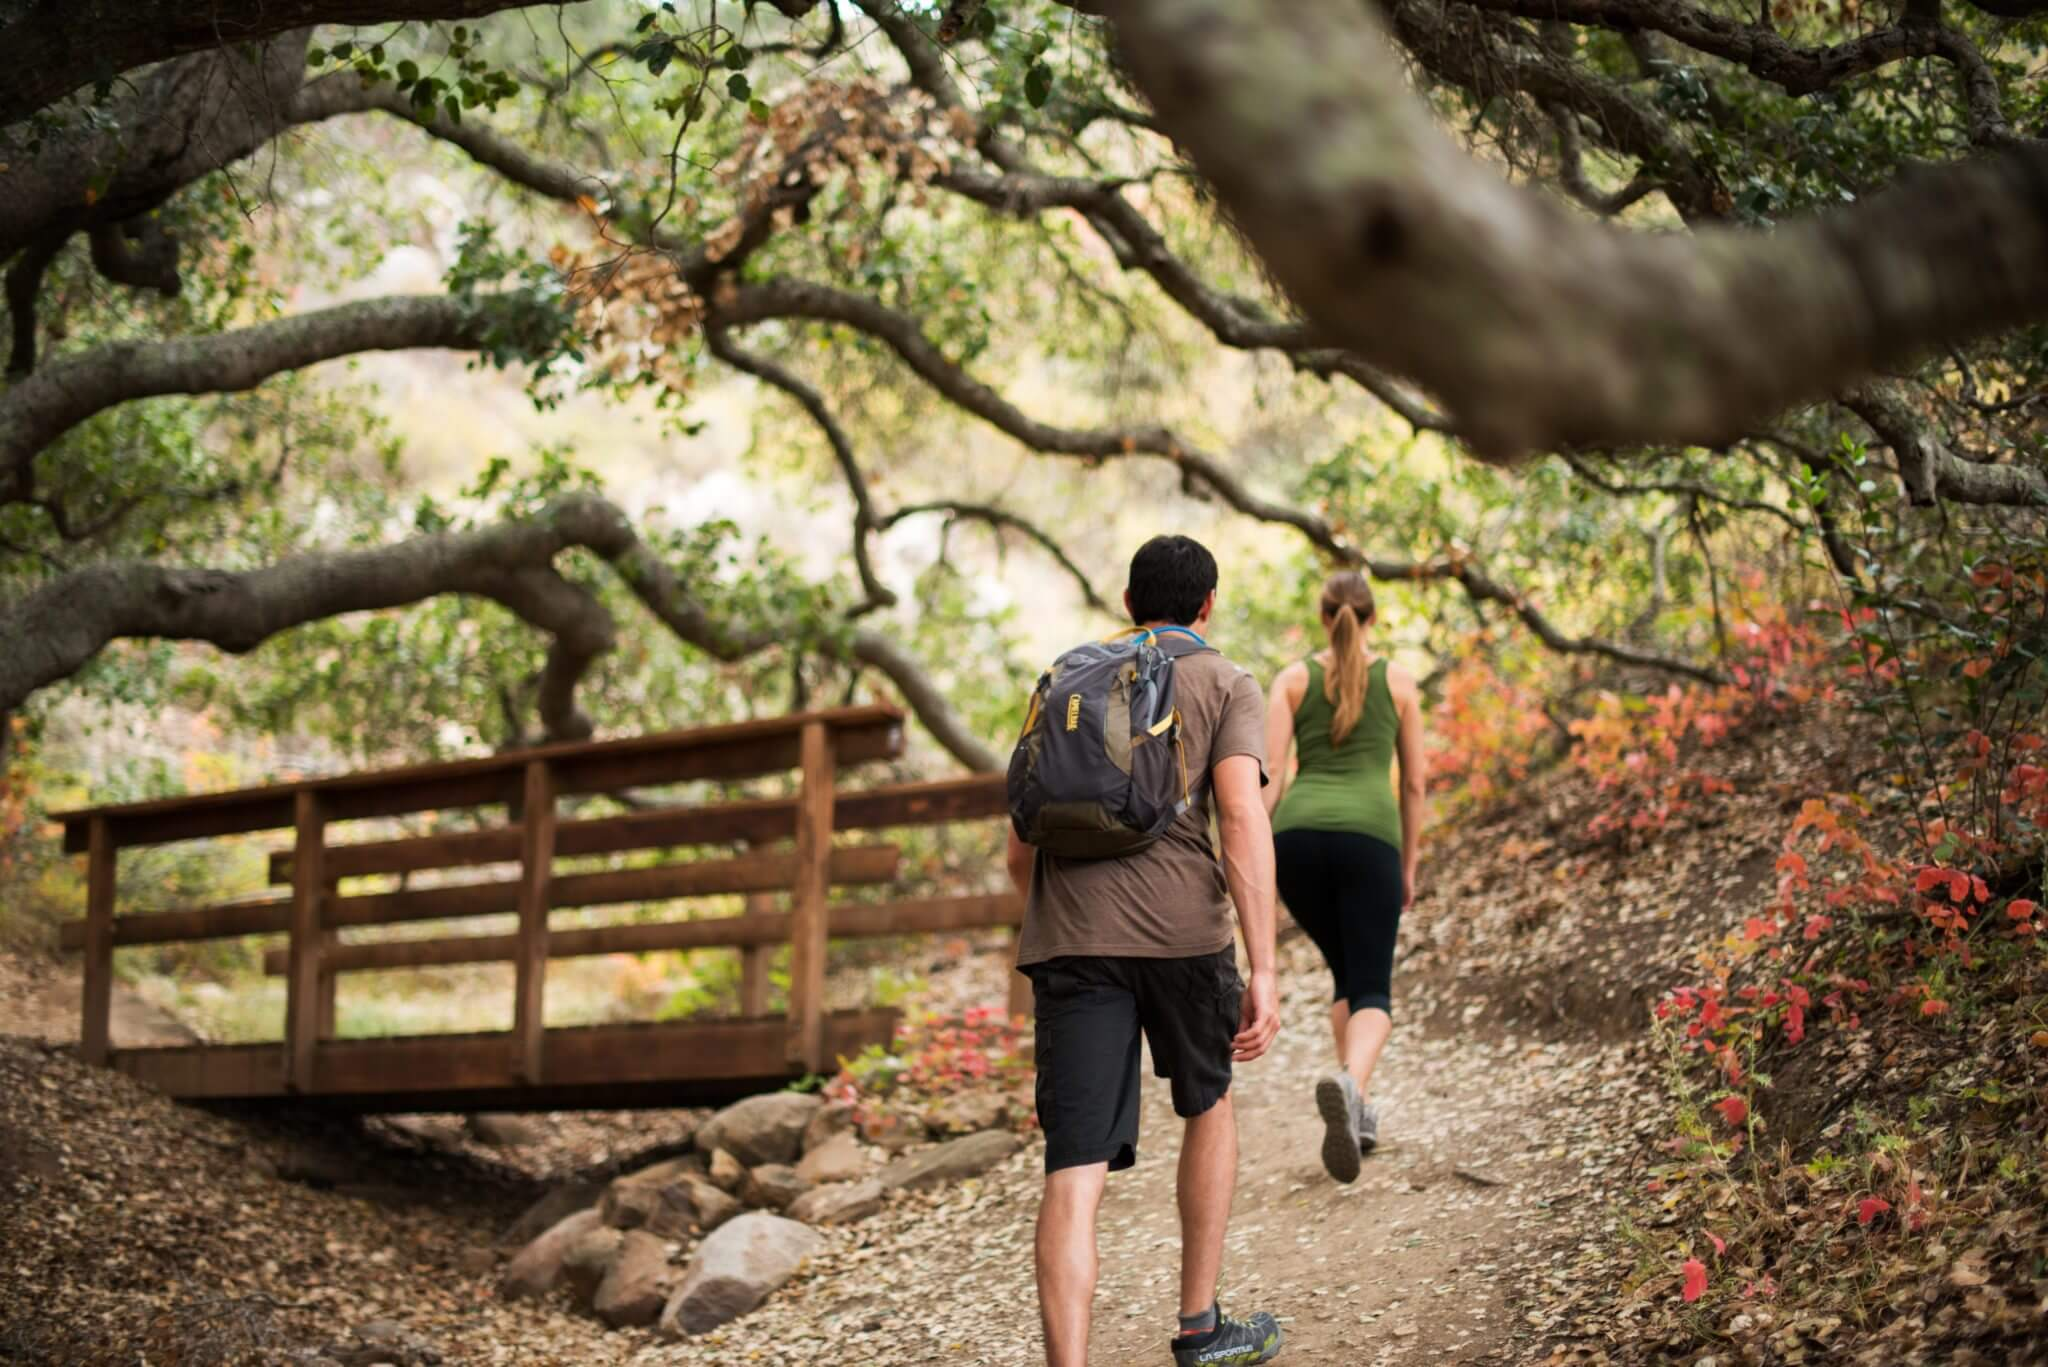 Couple's hike on a trail with a bridge